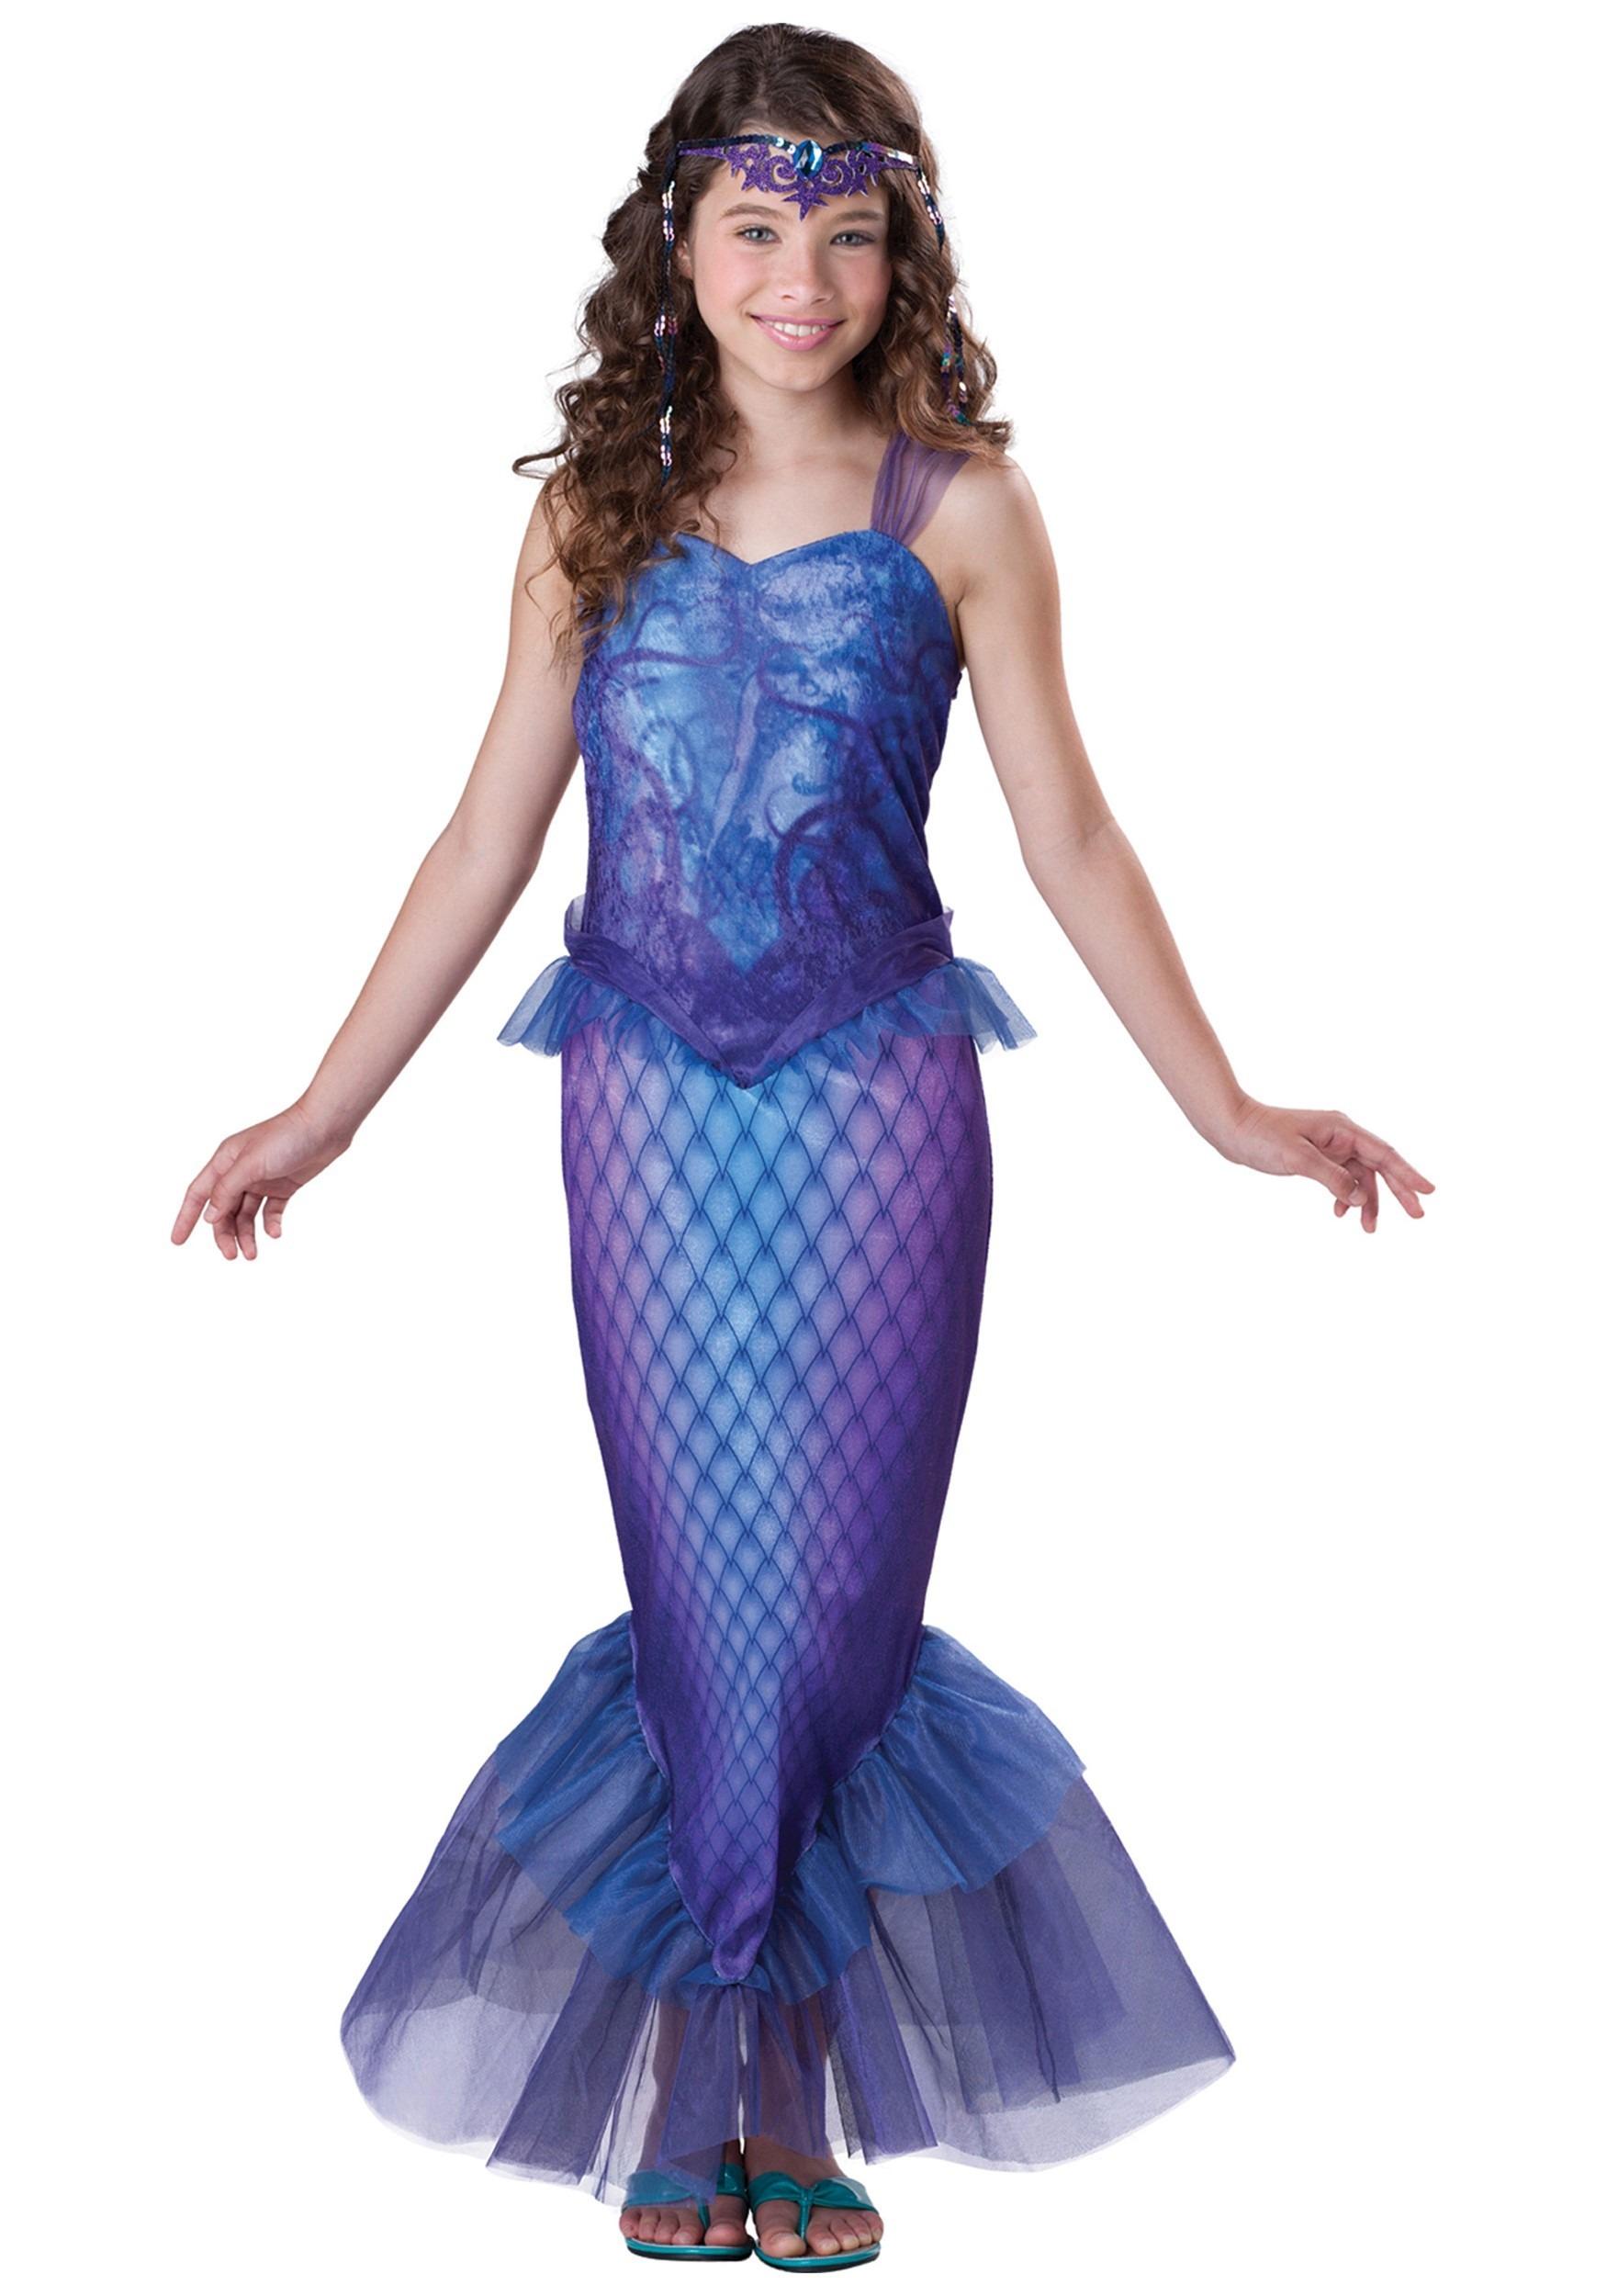 Mysterious Mermaid Costume for Tweens | Sea Creature Costumes